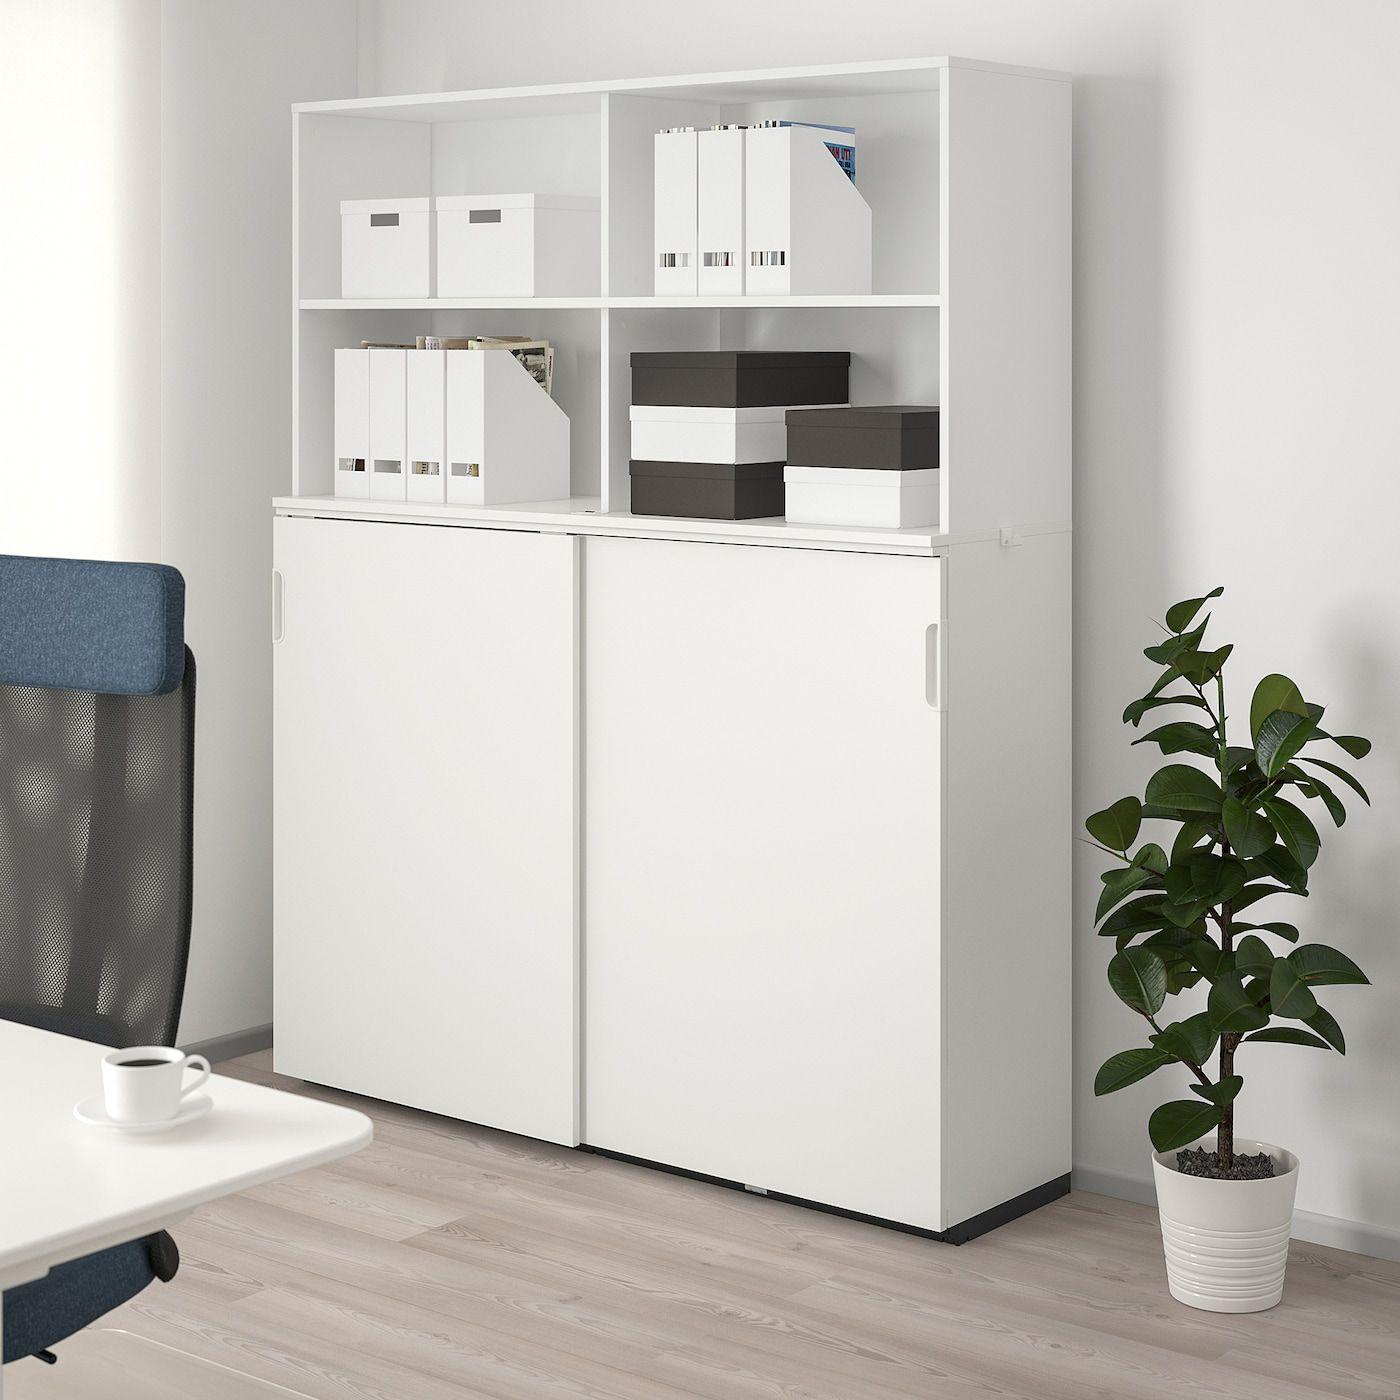 IKEA GALANT Storage combination with sliding doors